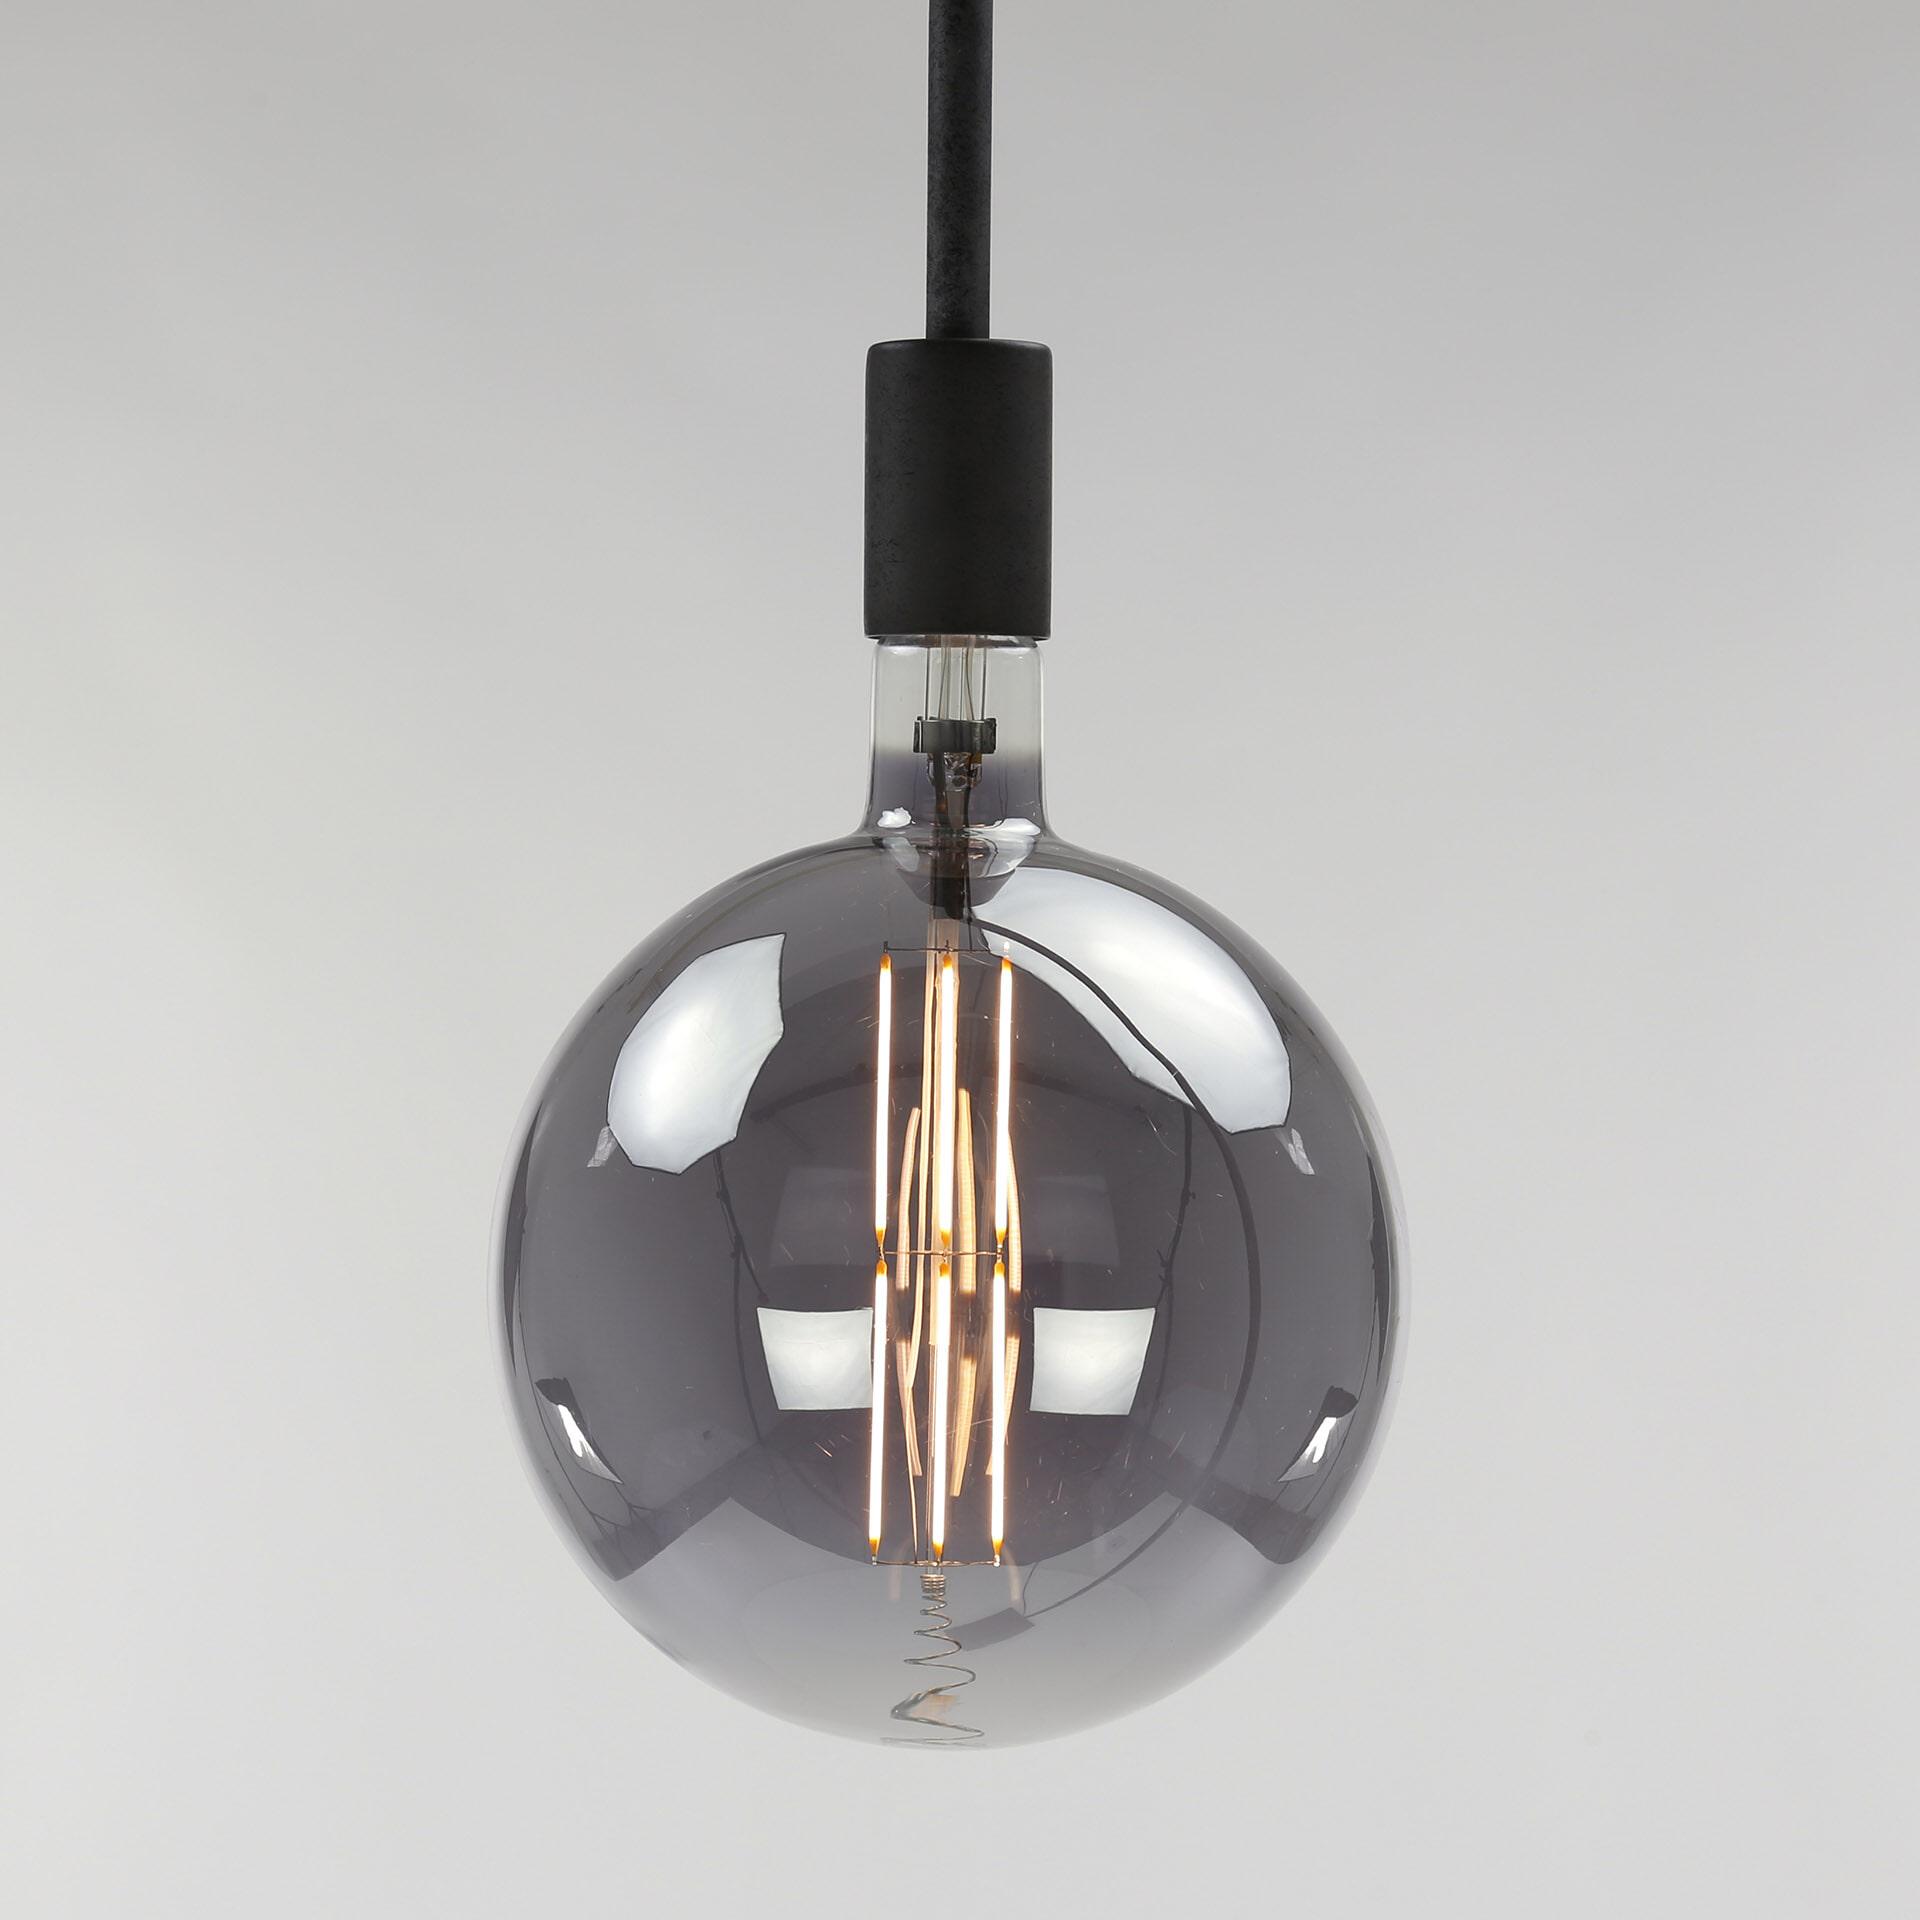 Kooldraadlamp 'Bol XXL' Ø20cm, LED E27 - 8W, Smoke grey, dimbaar